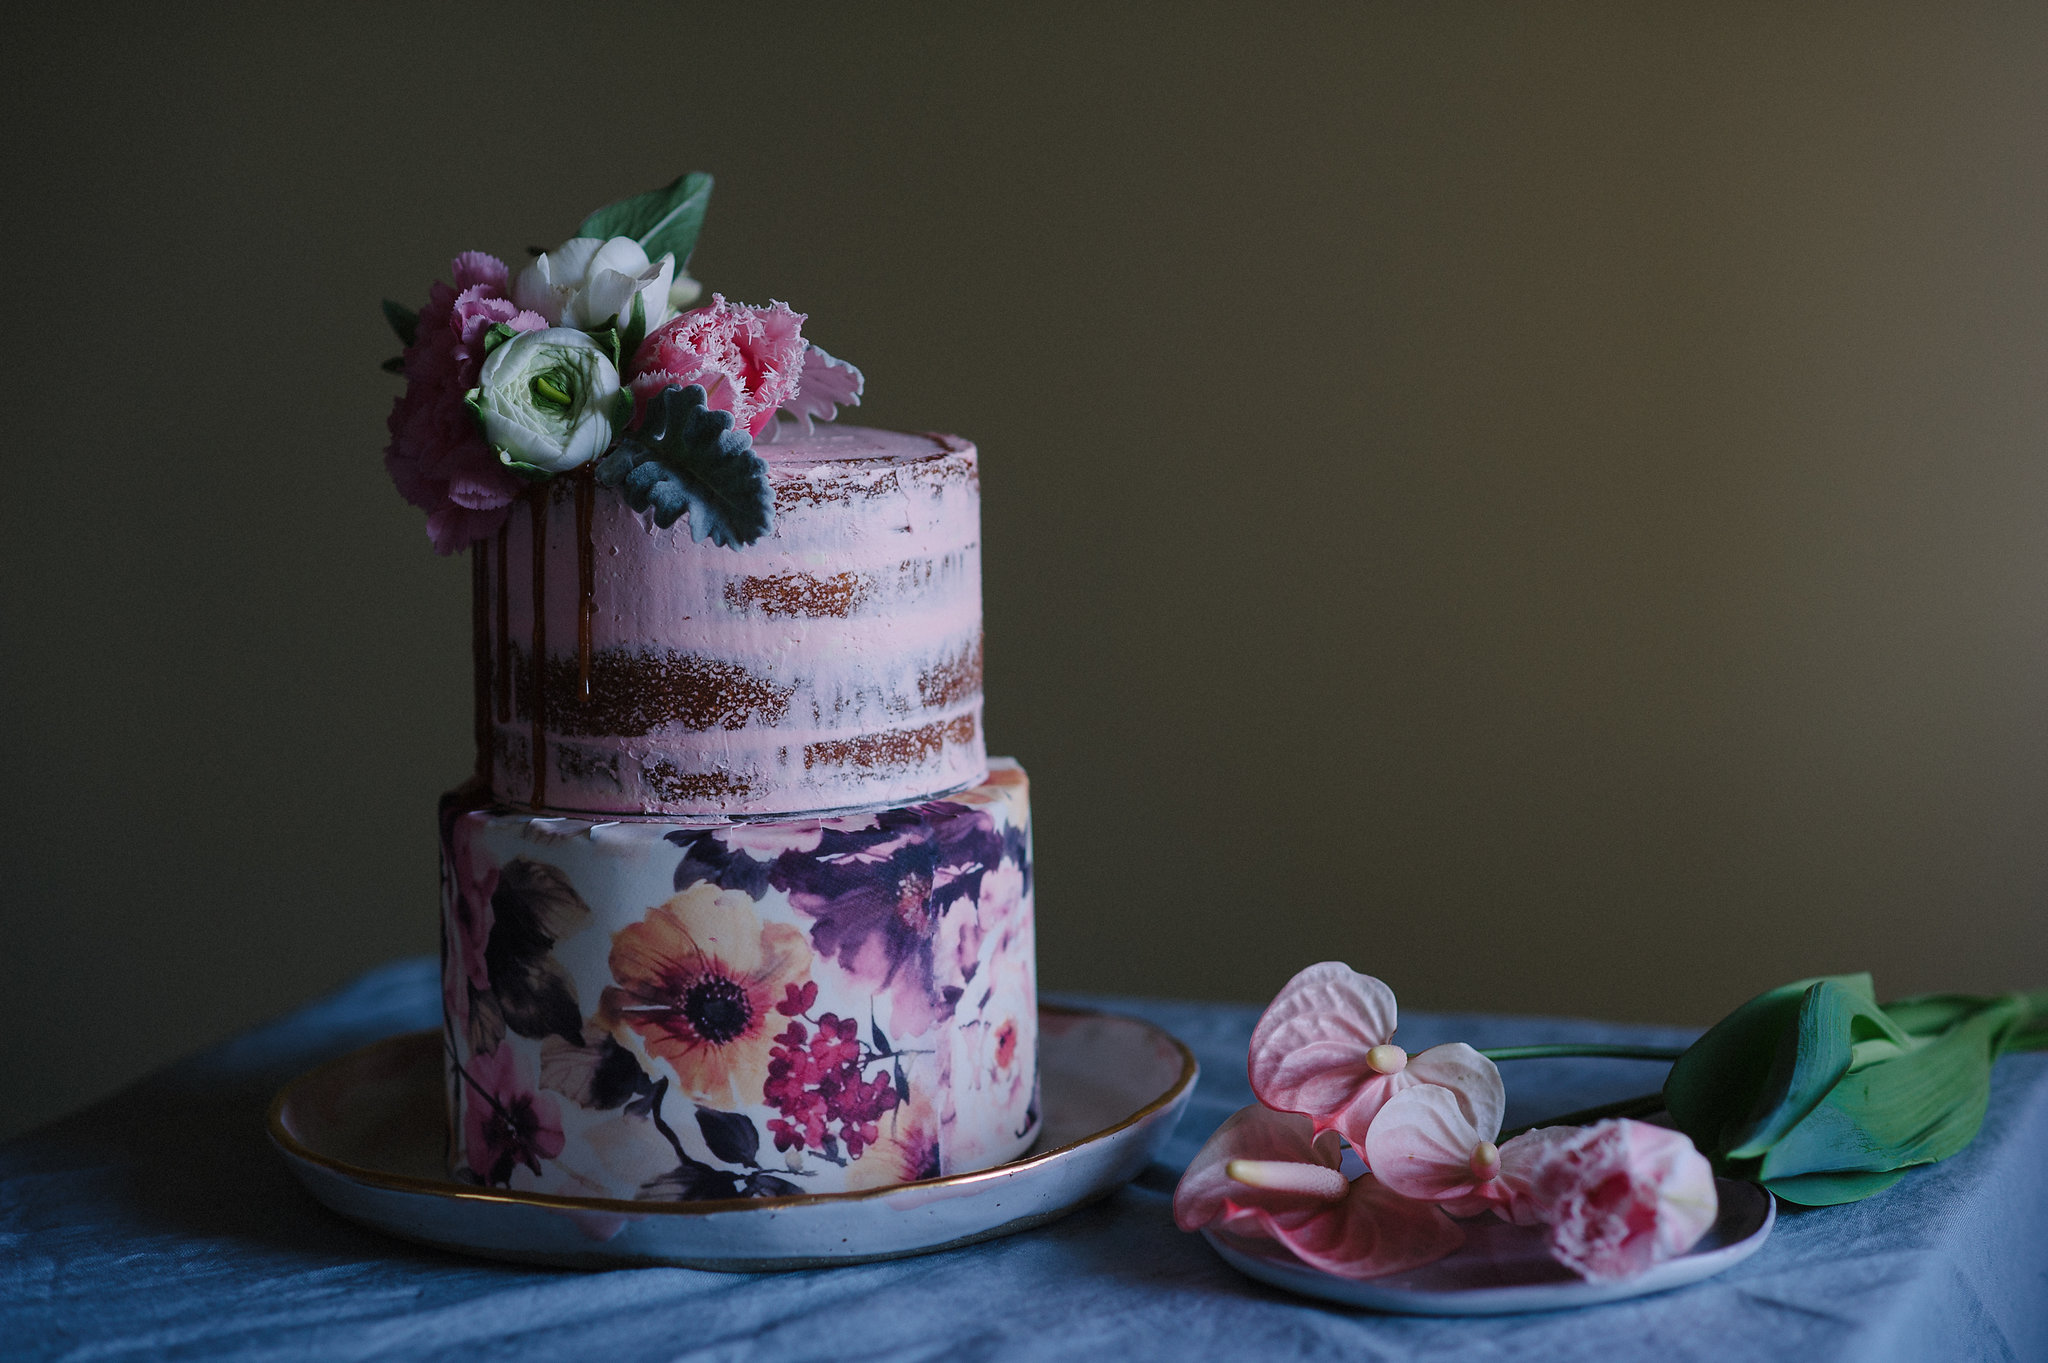 cherry-cakes-10-001 (1).jpg